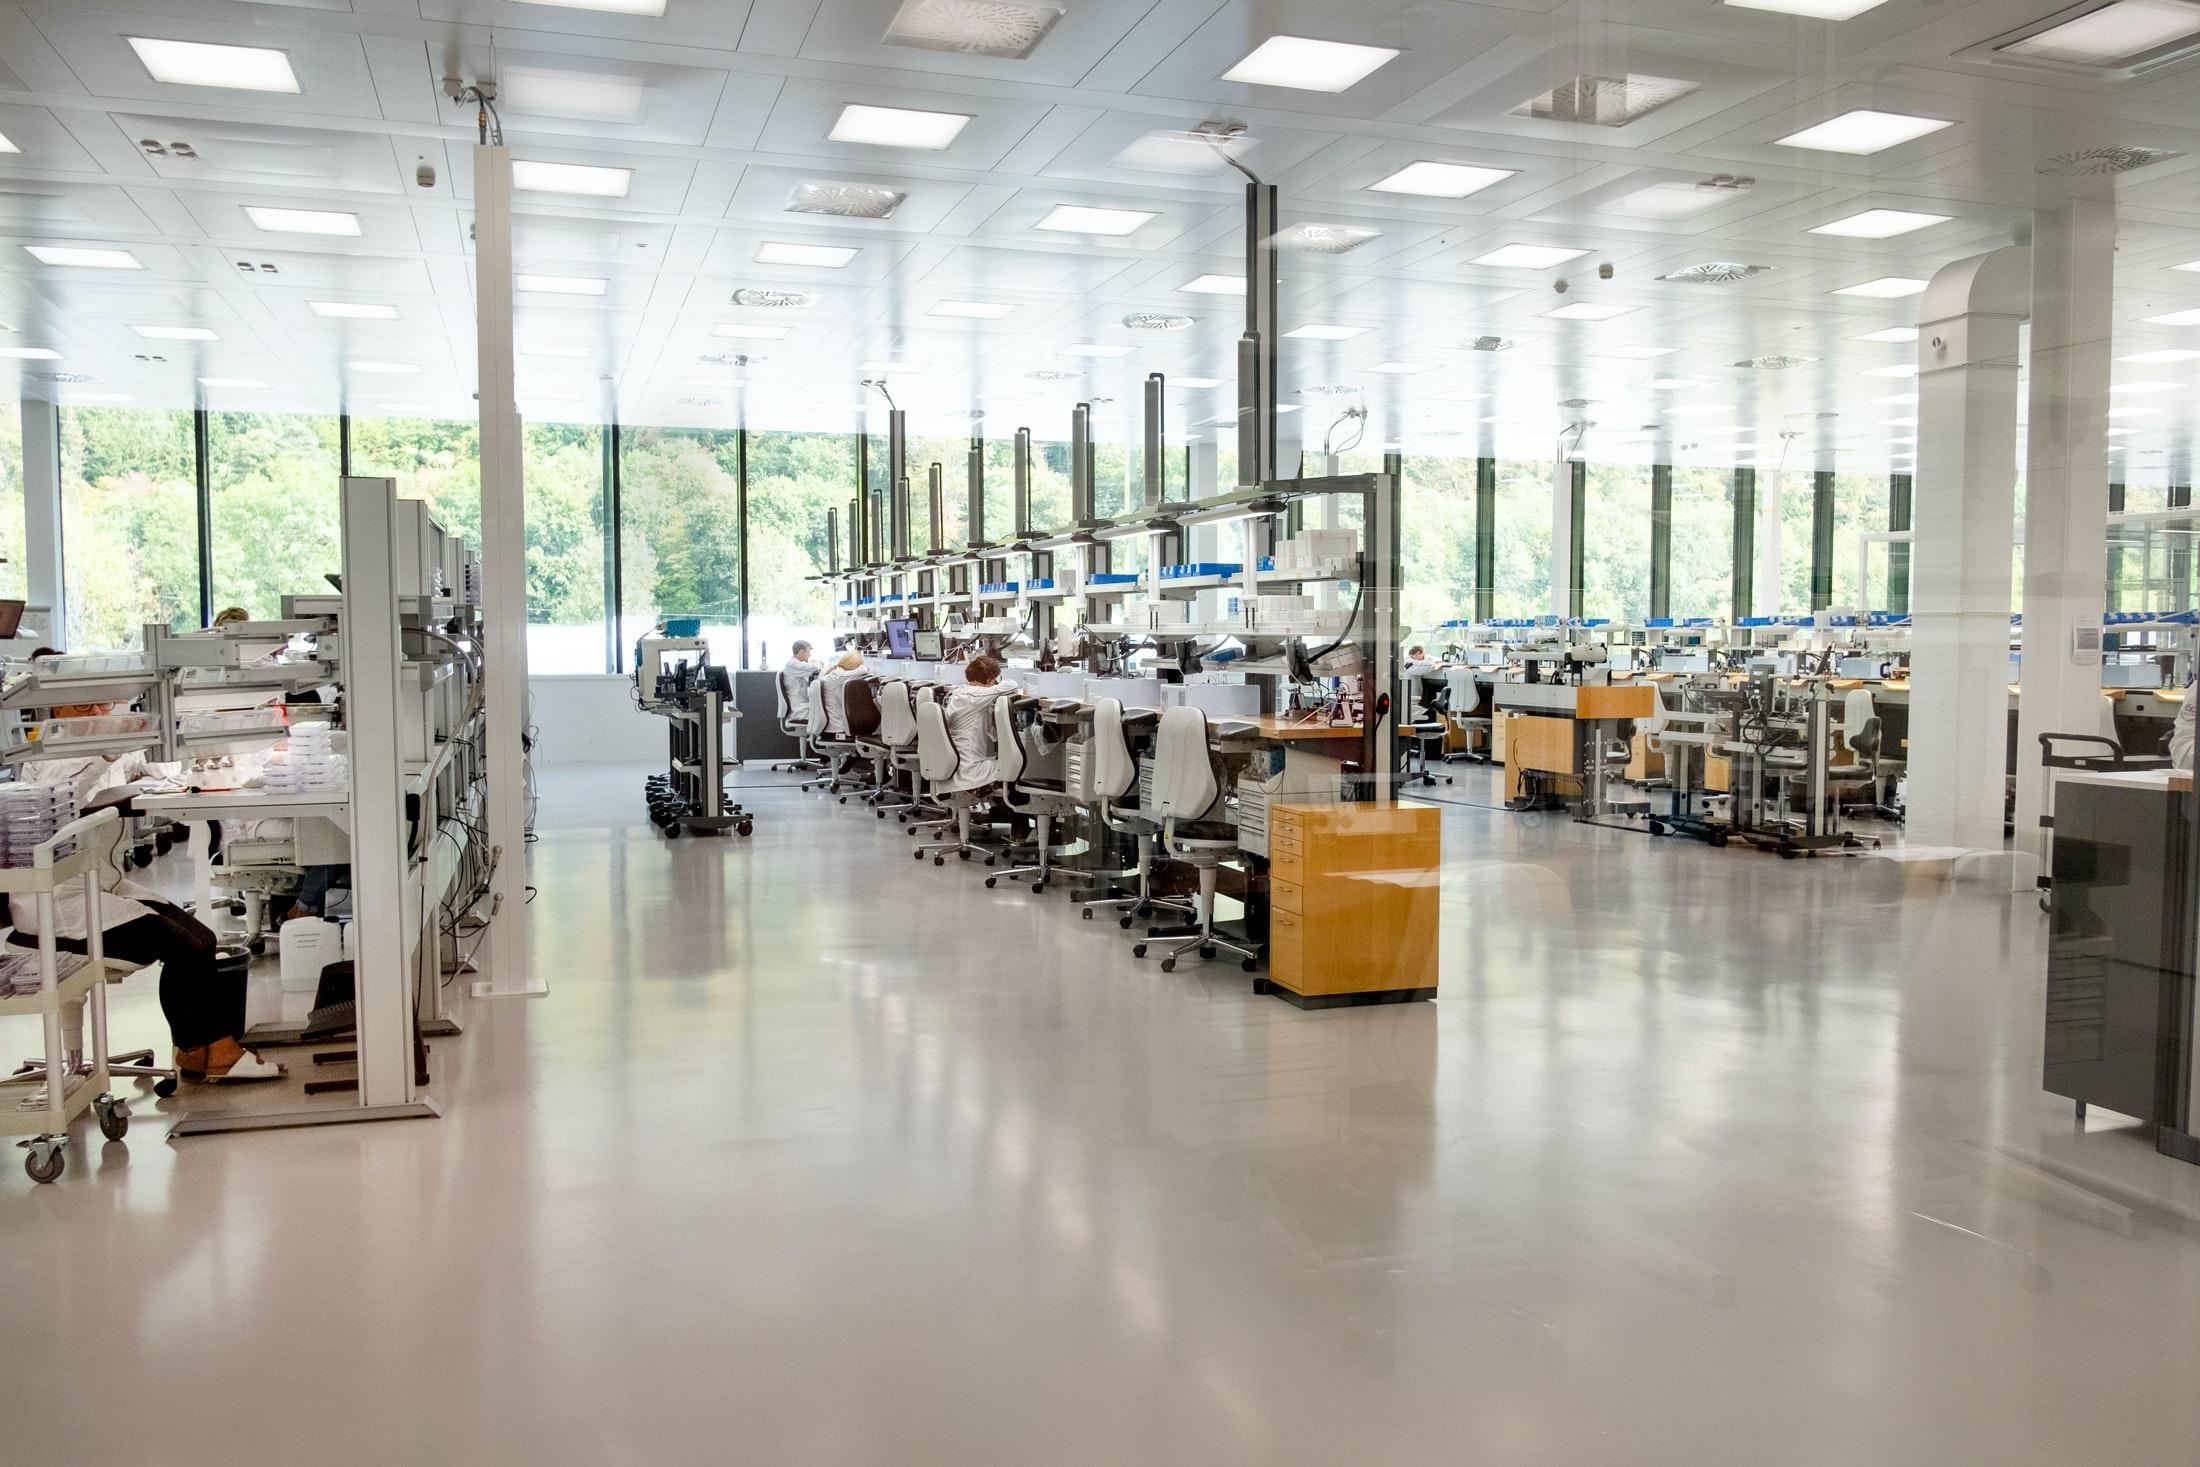 Inside The Manufacture: The New IWC Manufakturzentrum DSCF9336